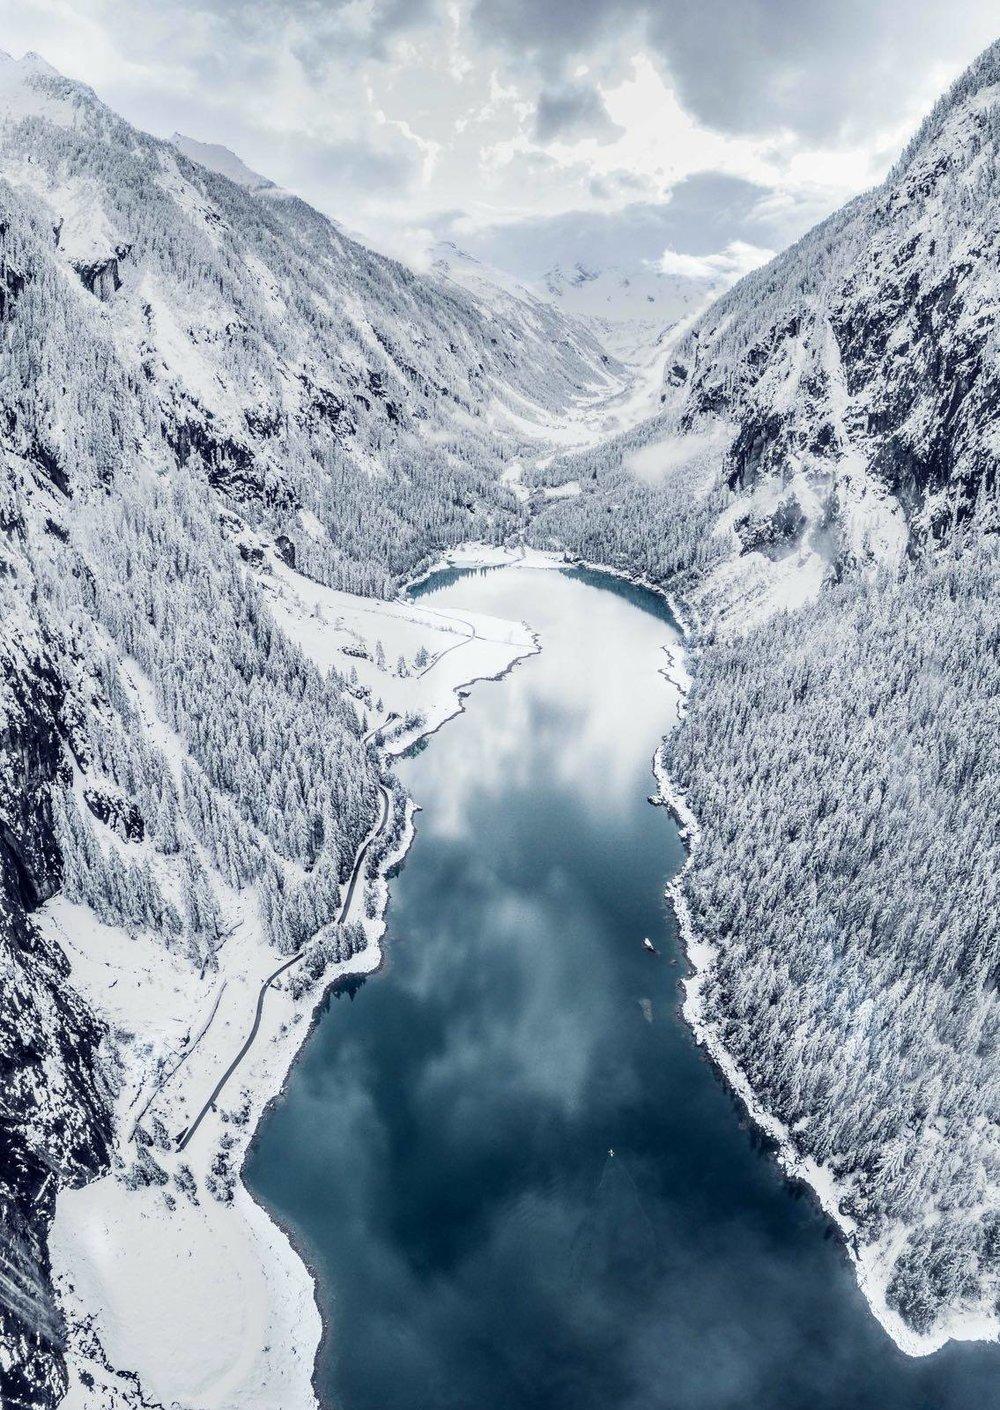 Mayrhofen 8/11/17